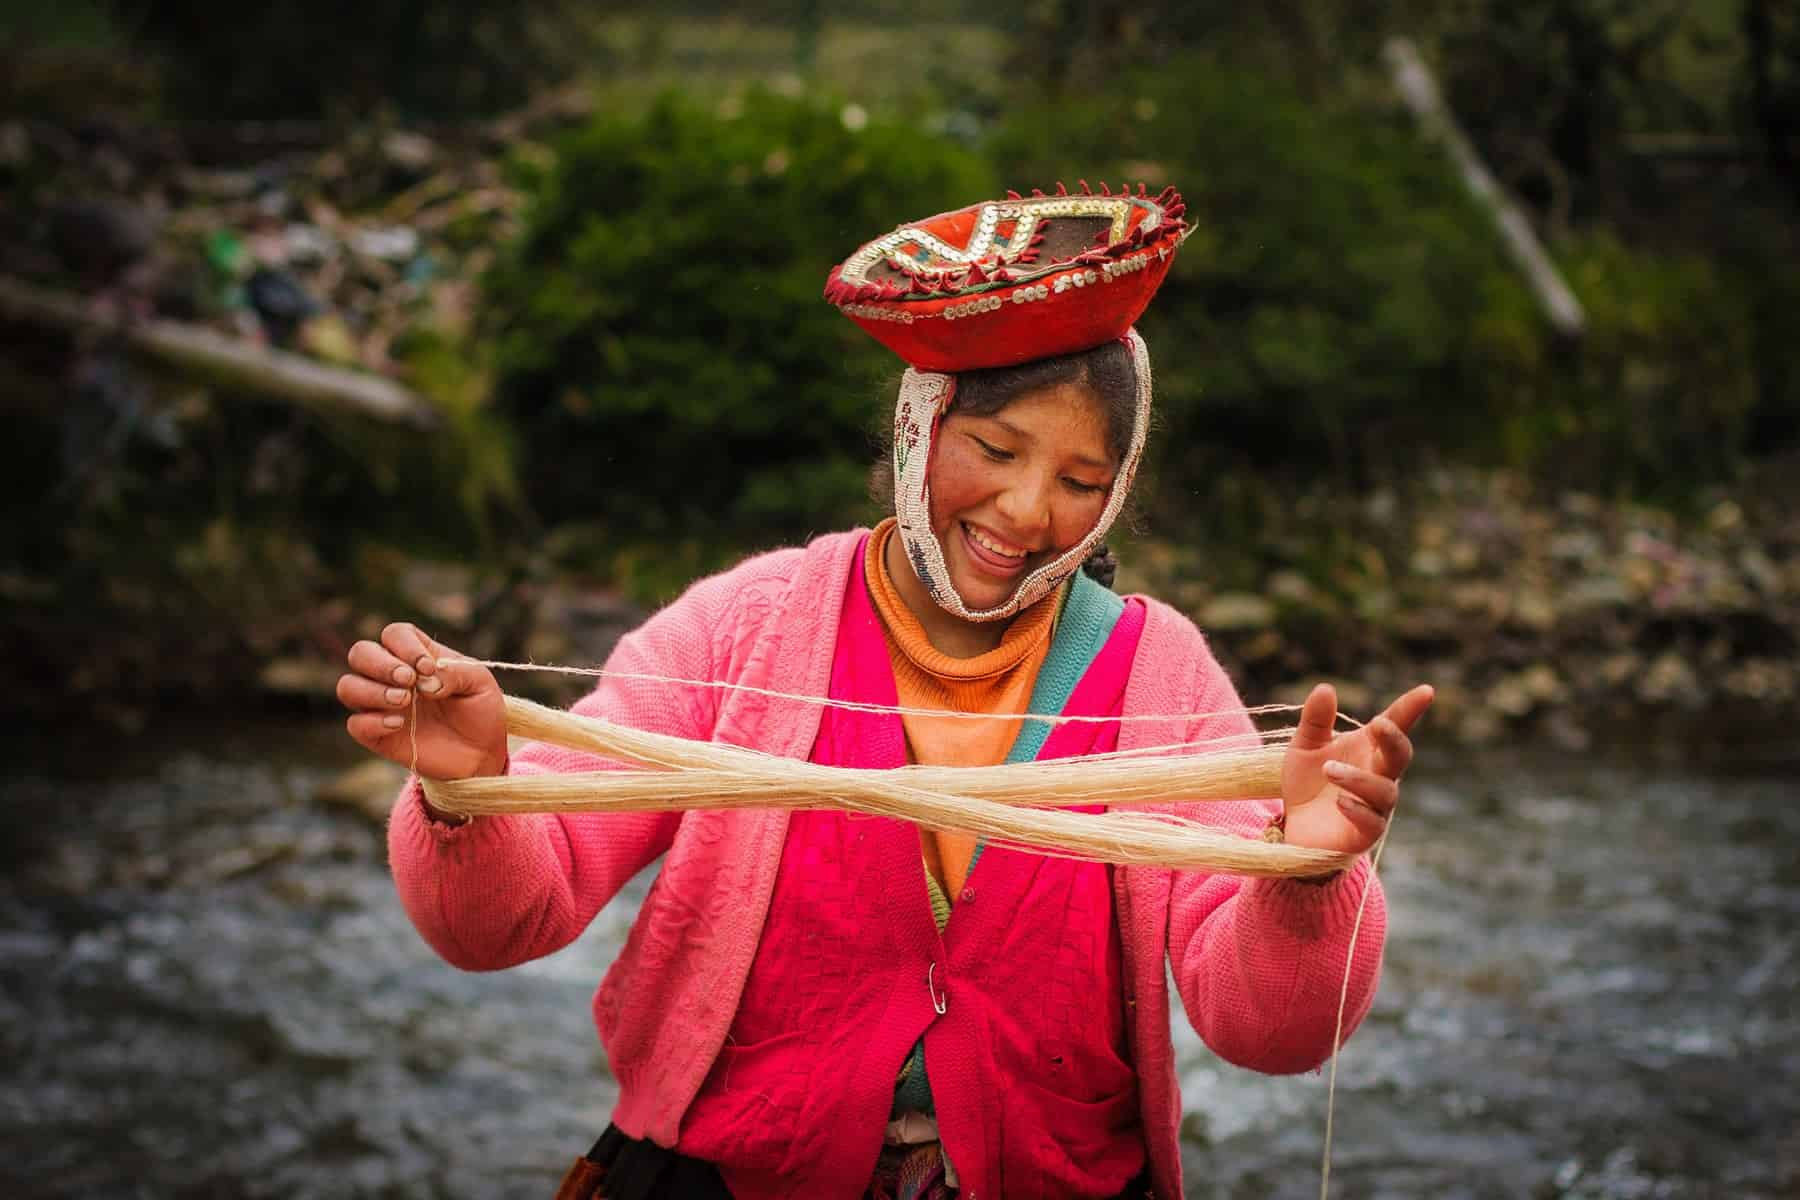 Threads of Peru weaver